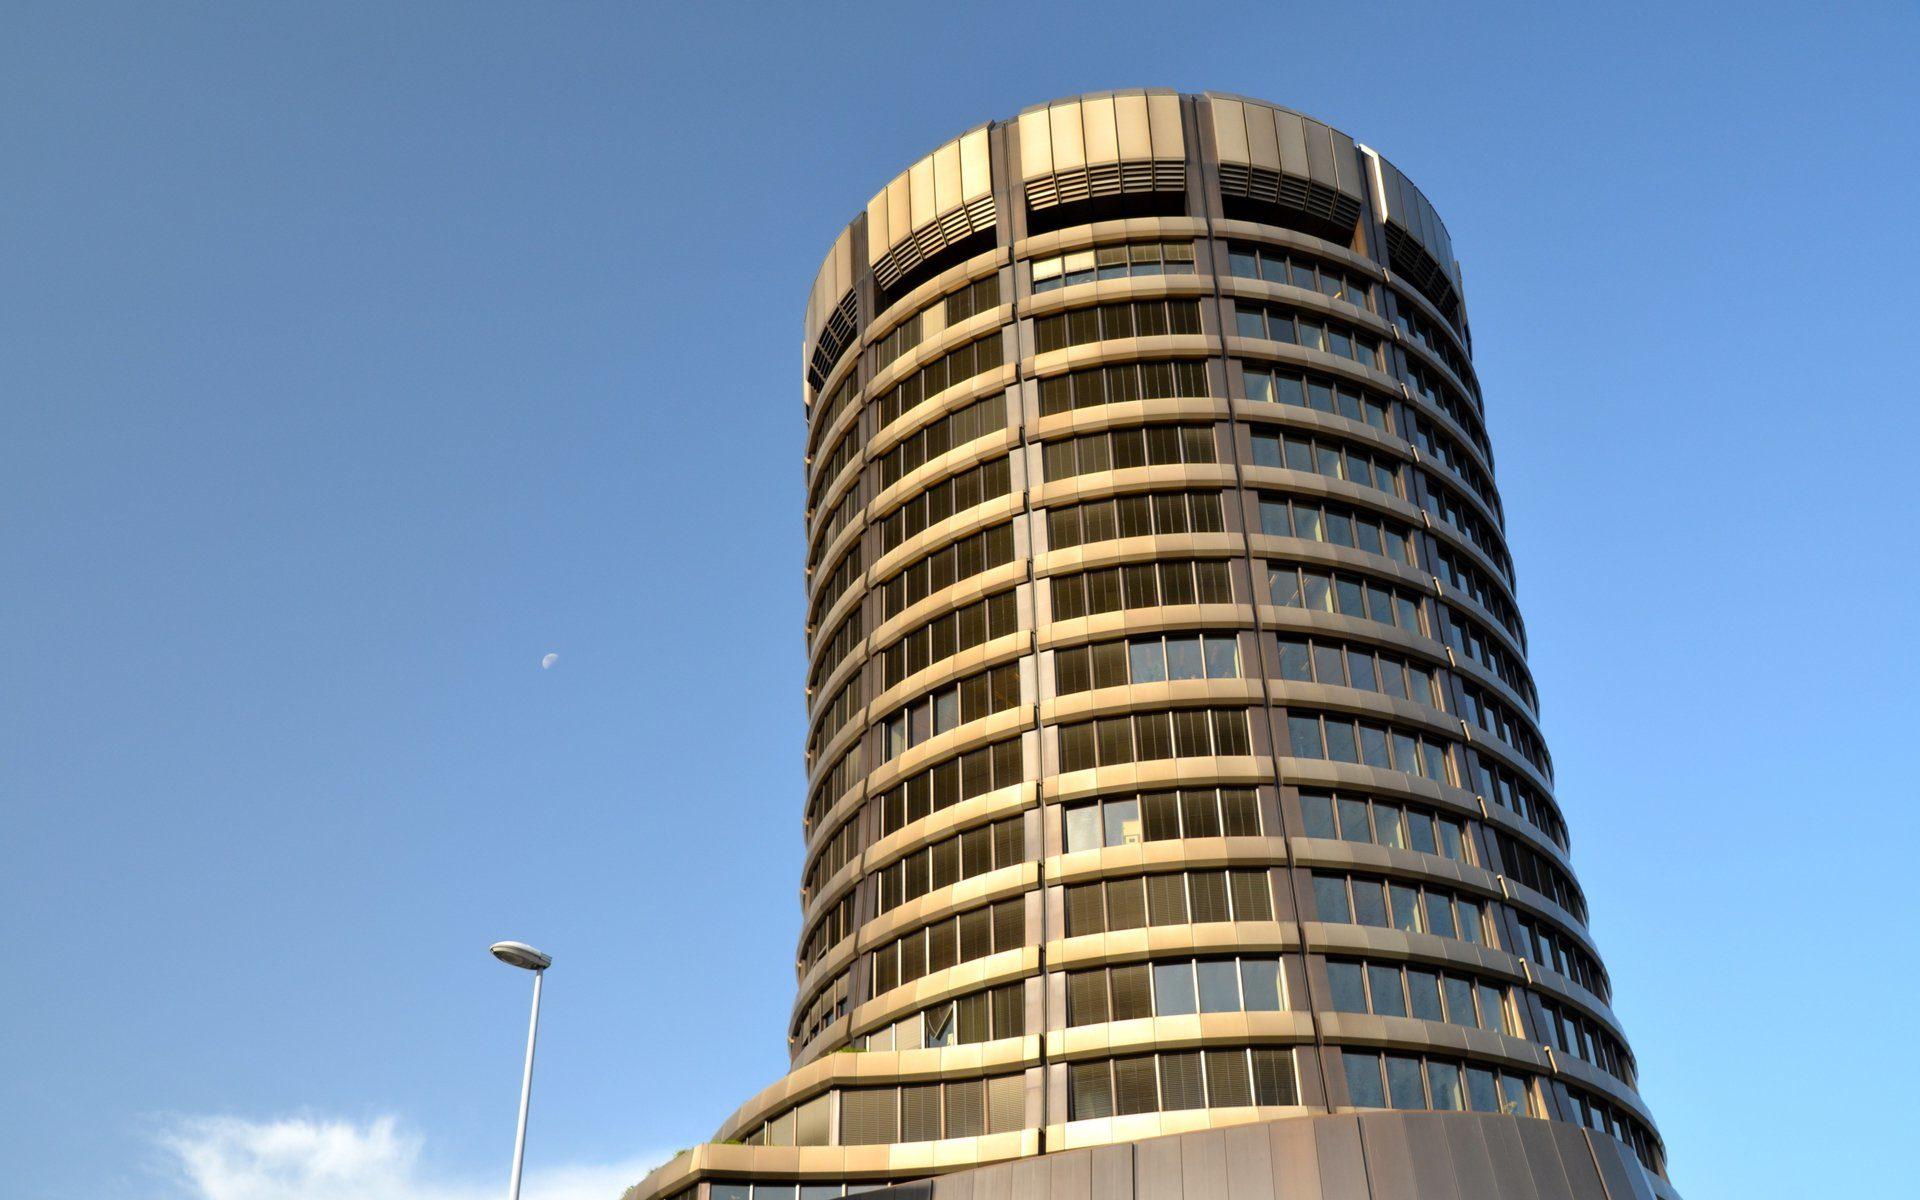 BIS bank basel switzerland